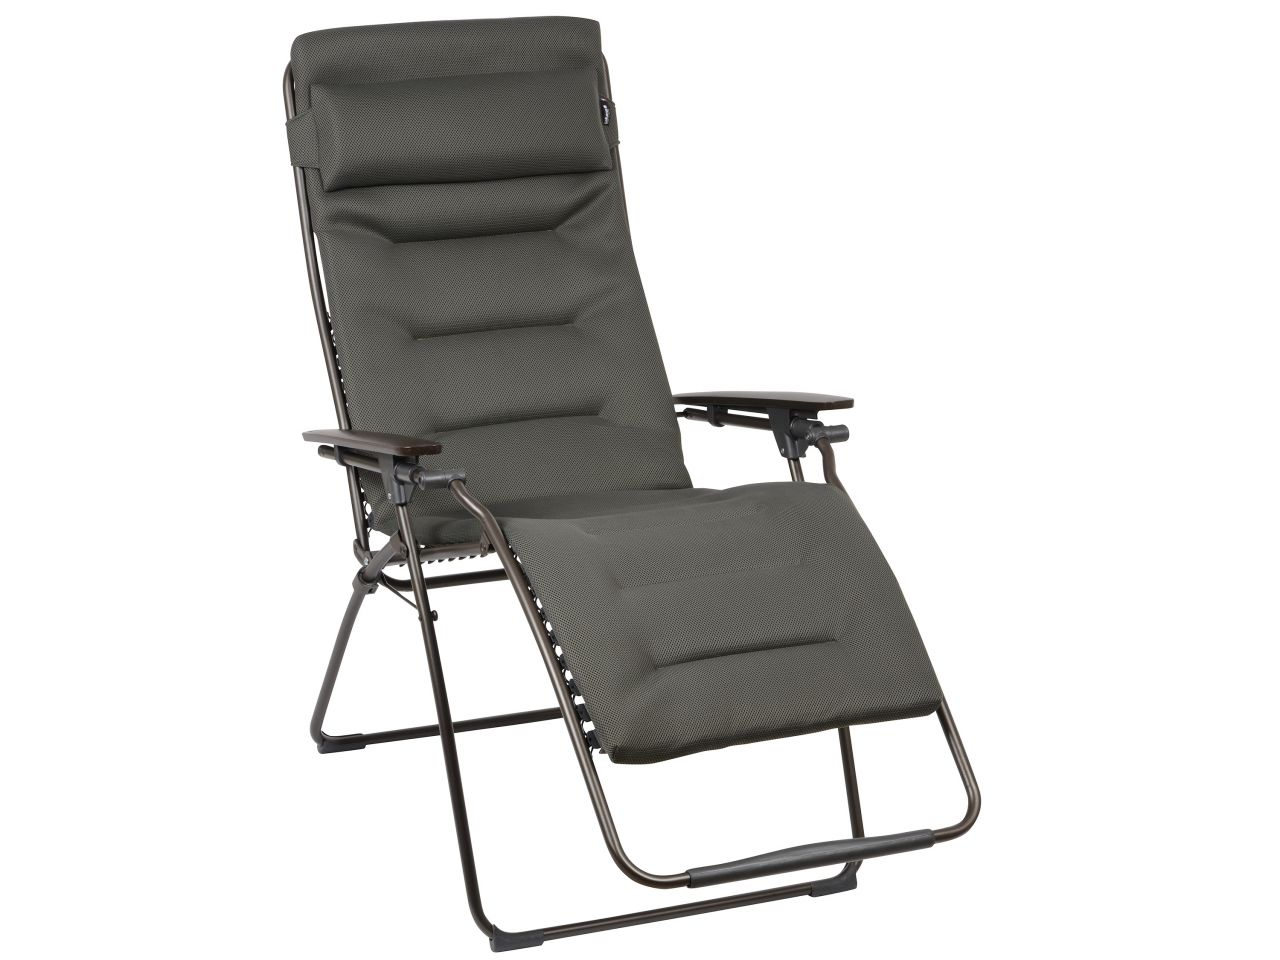 Relaxliege Futura Air Comfort taupe